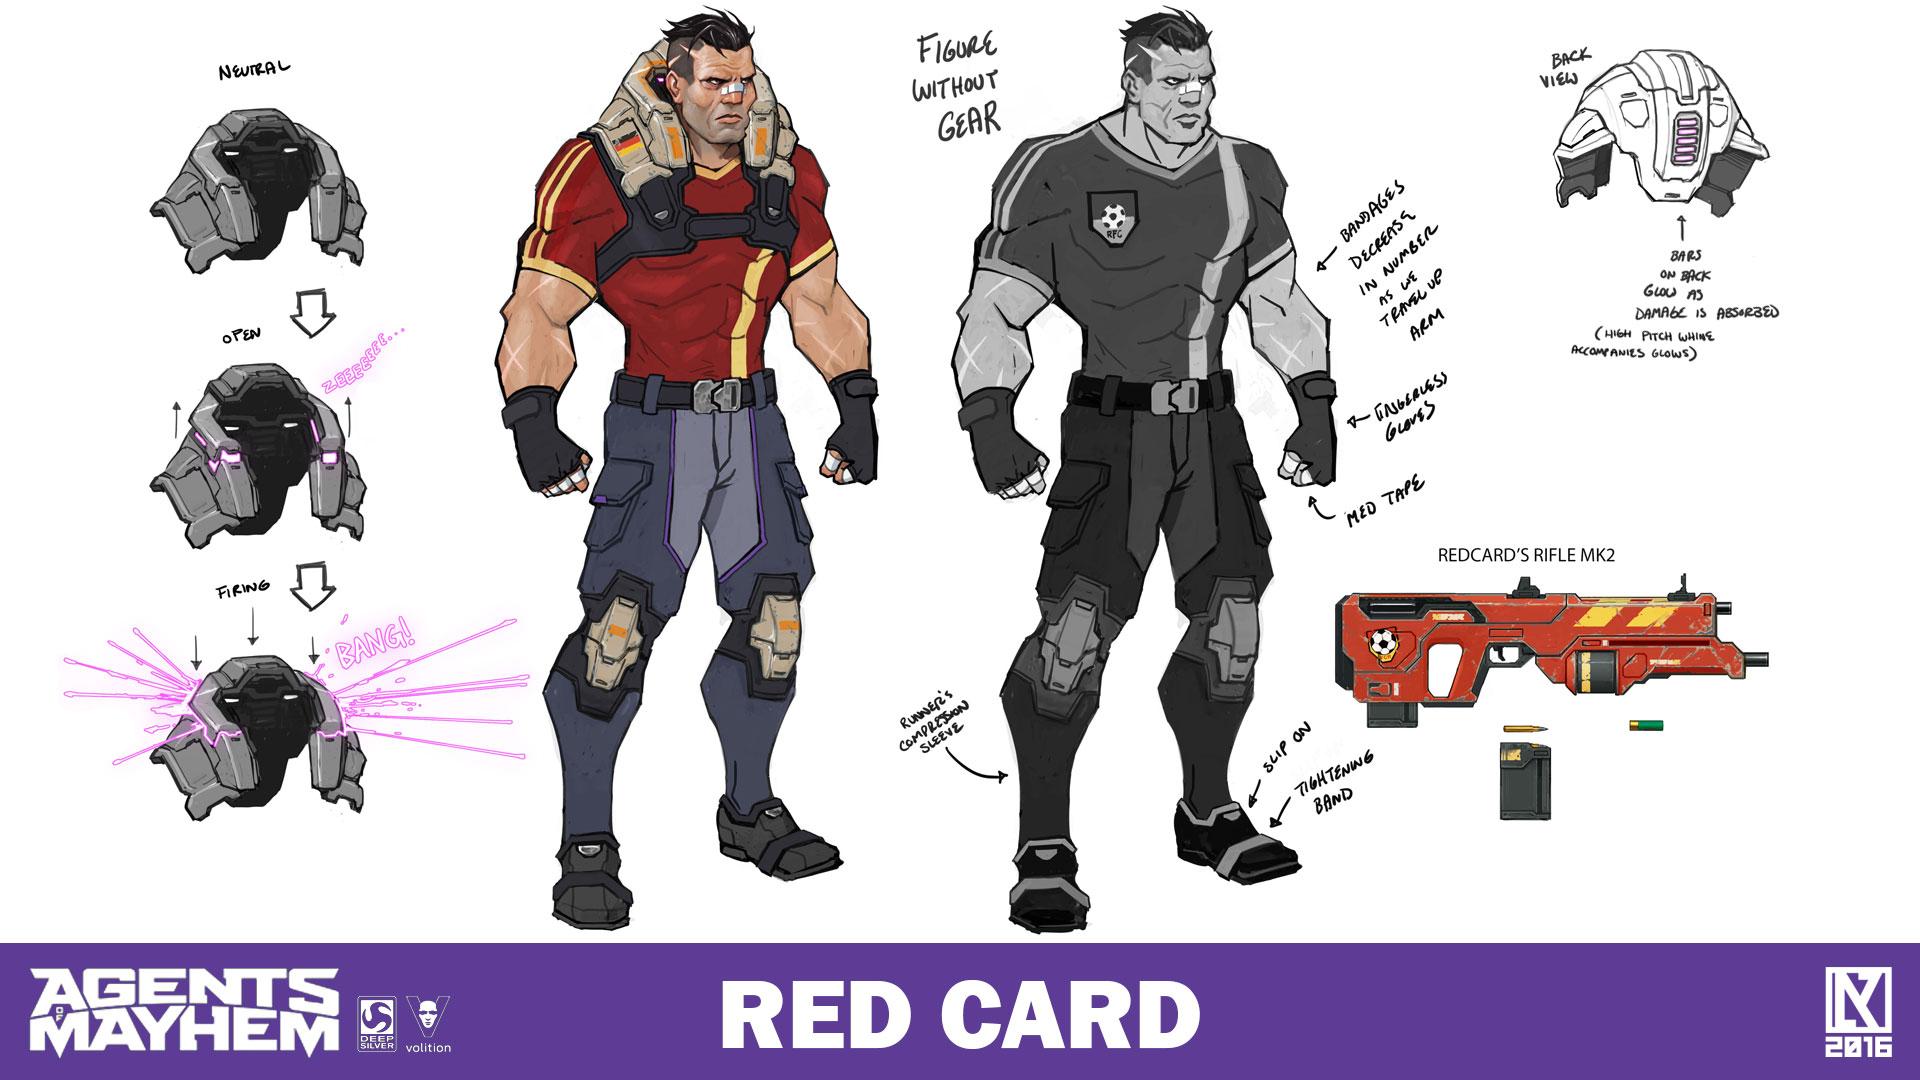 portfolio_red_card.jpg